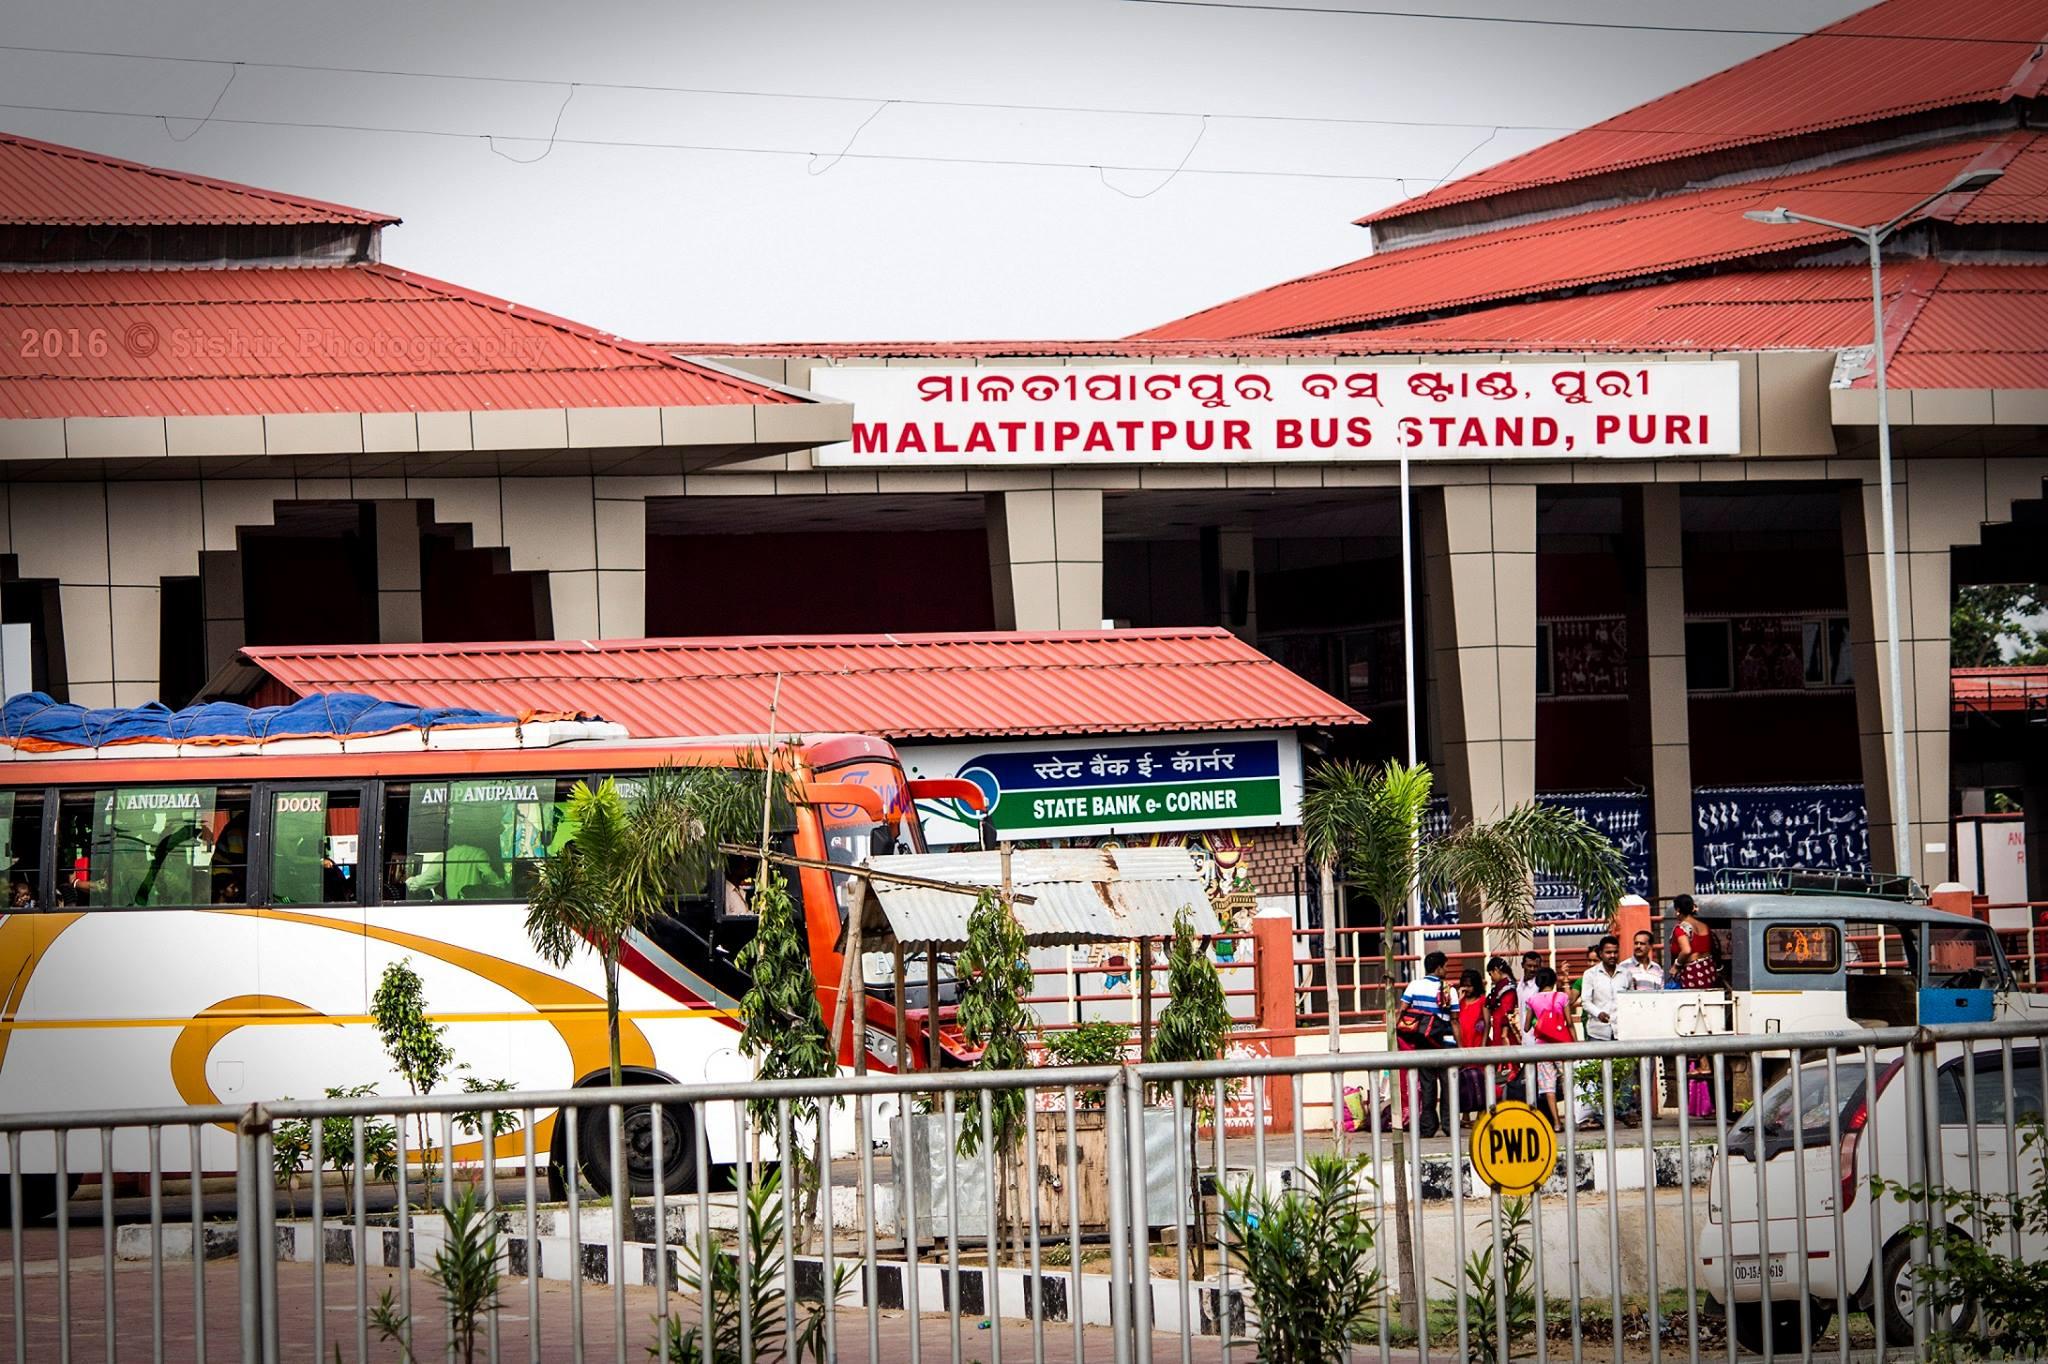 Malatipatpur bus stand. Photo: Facebook